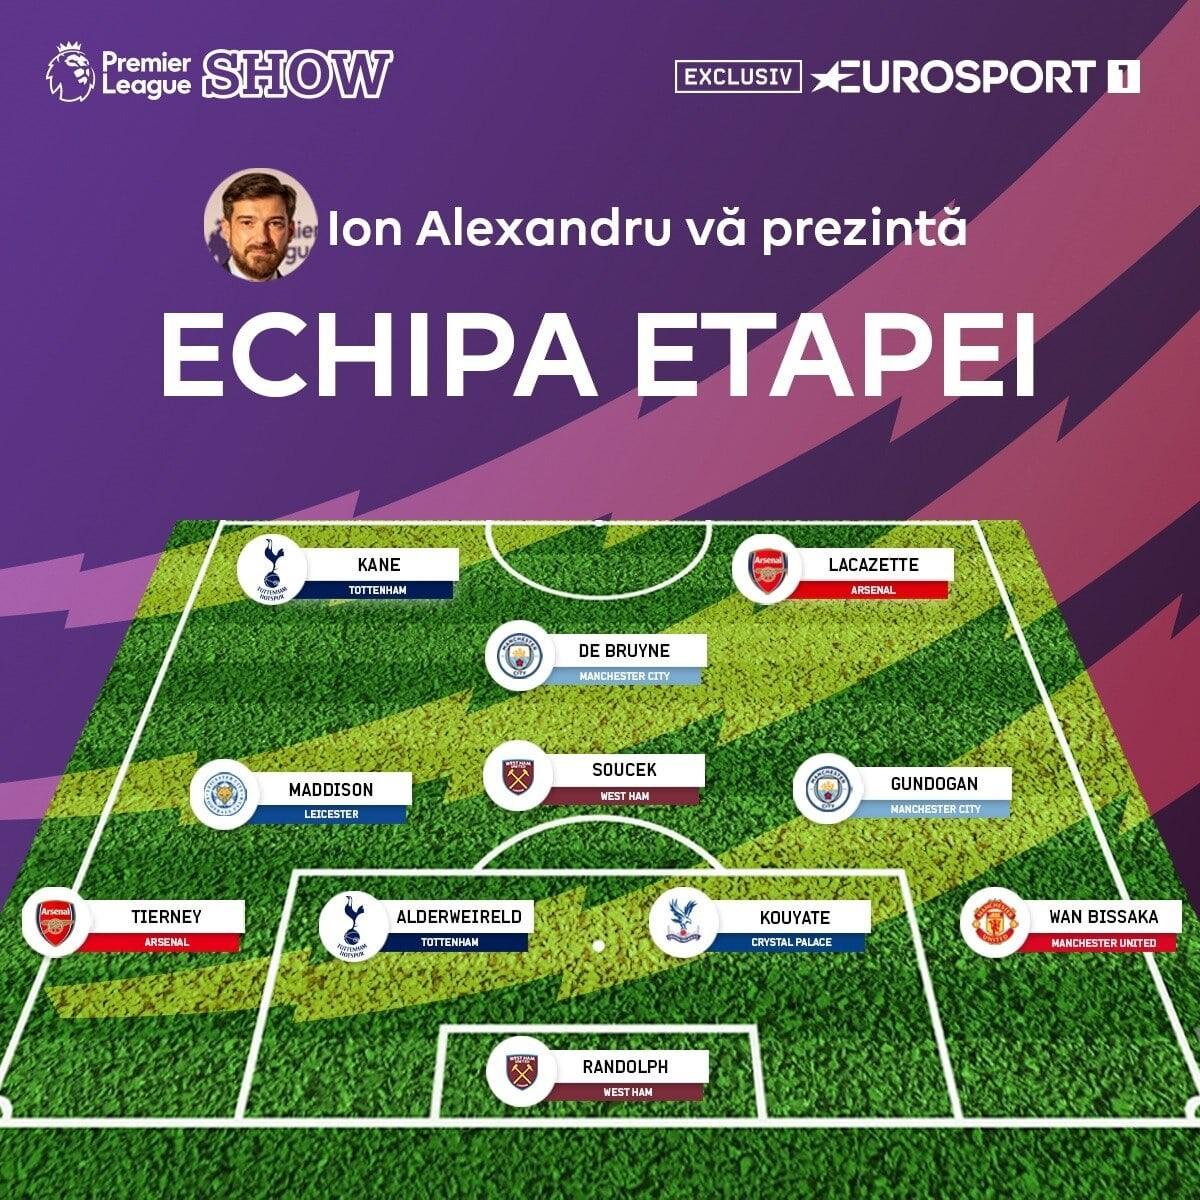 https://i.eurosport.com/2021/01/05/2965699.jpg